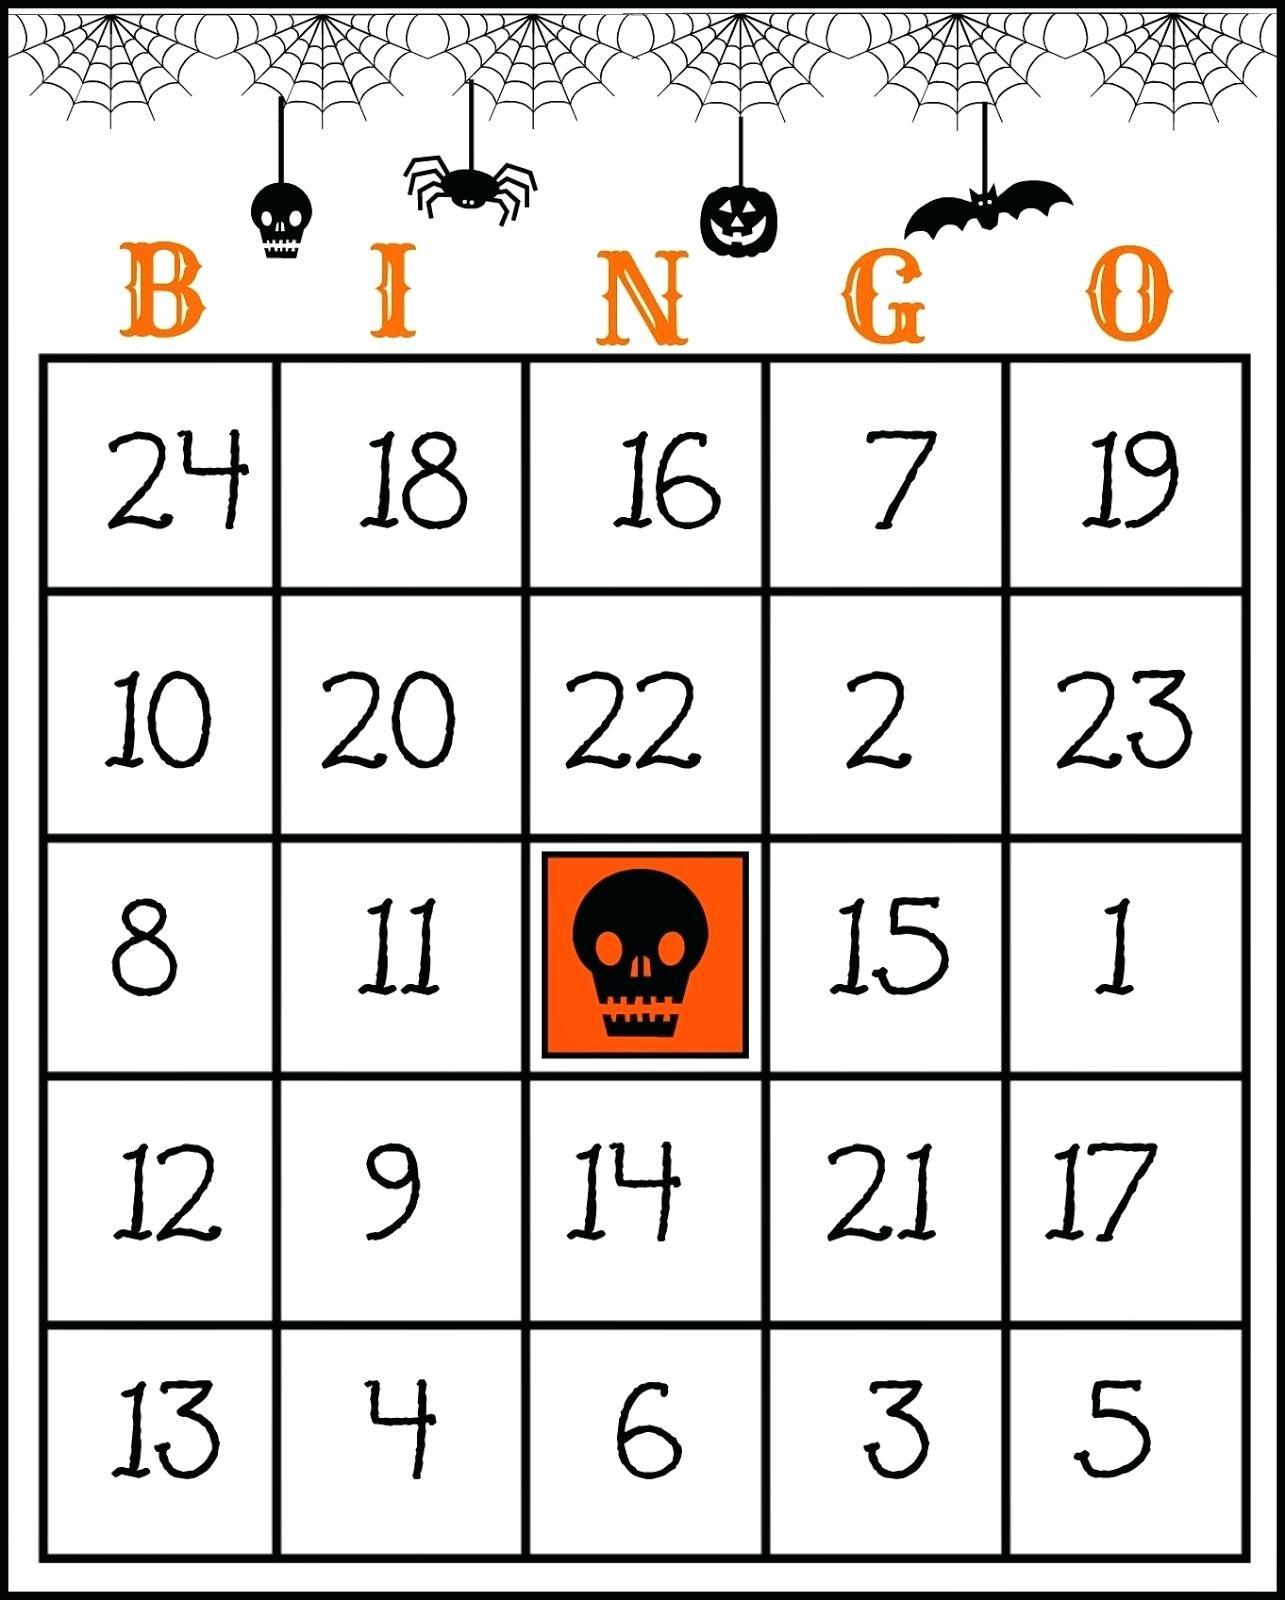 Maths Bingo Free Add One More Bingo Free Maths Bingo Cards Printable - Fraction Bingo Cards Printable Free